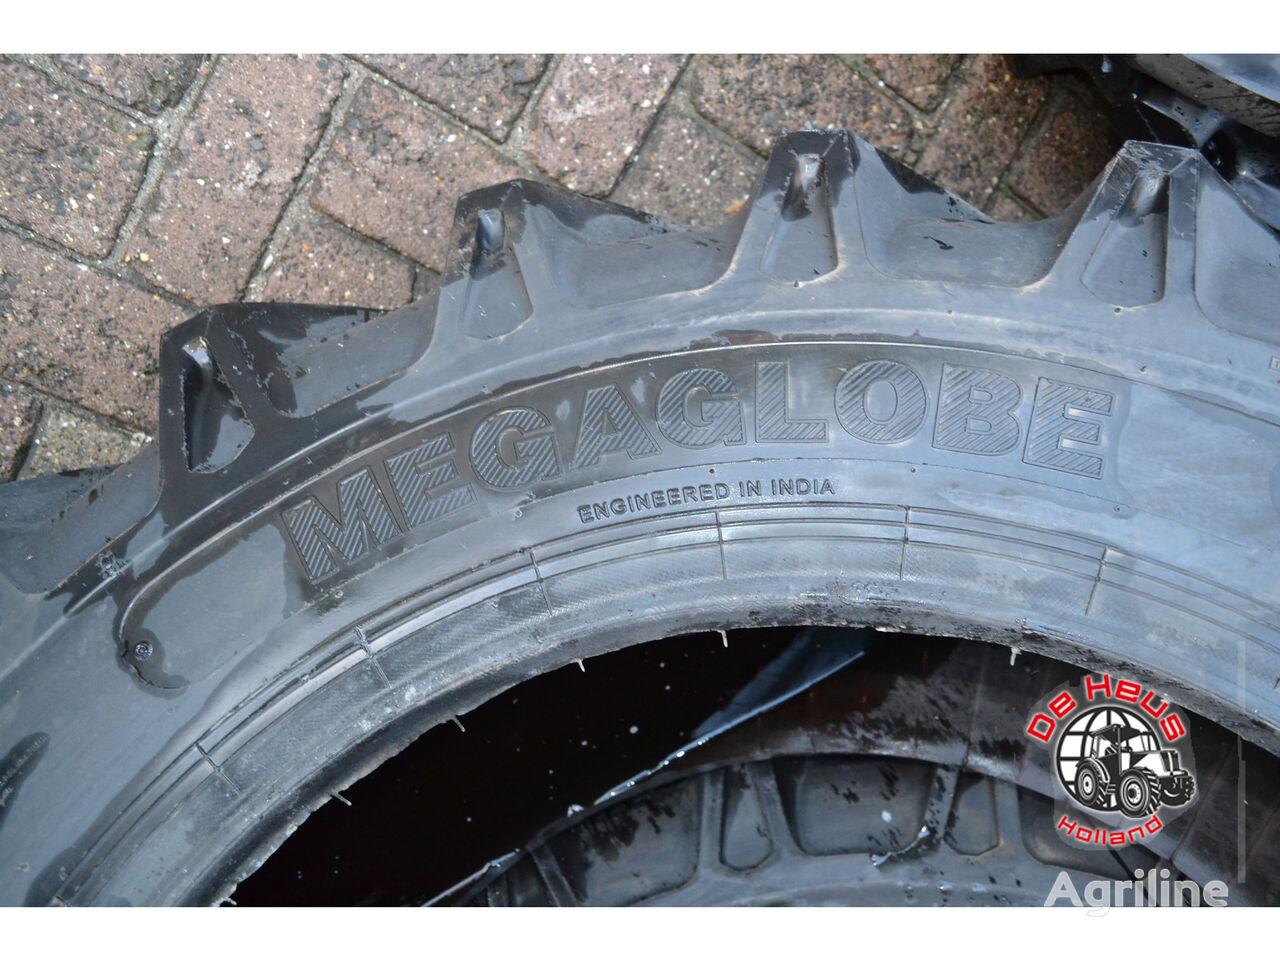 vente des pneu de tracteur megaglobe 16 9 30 neuf du pays. Black Bedroom Furniture Sets. Home Design Ideas